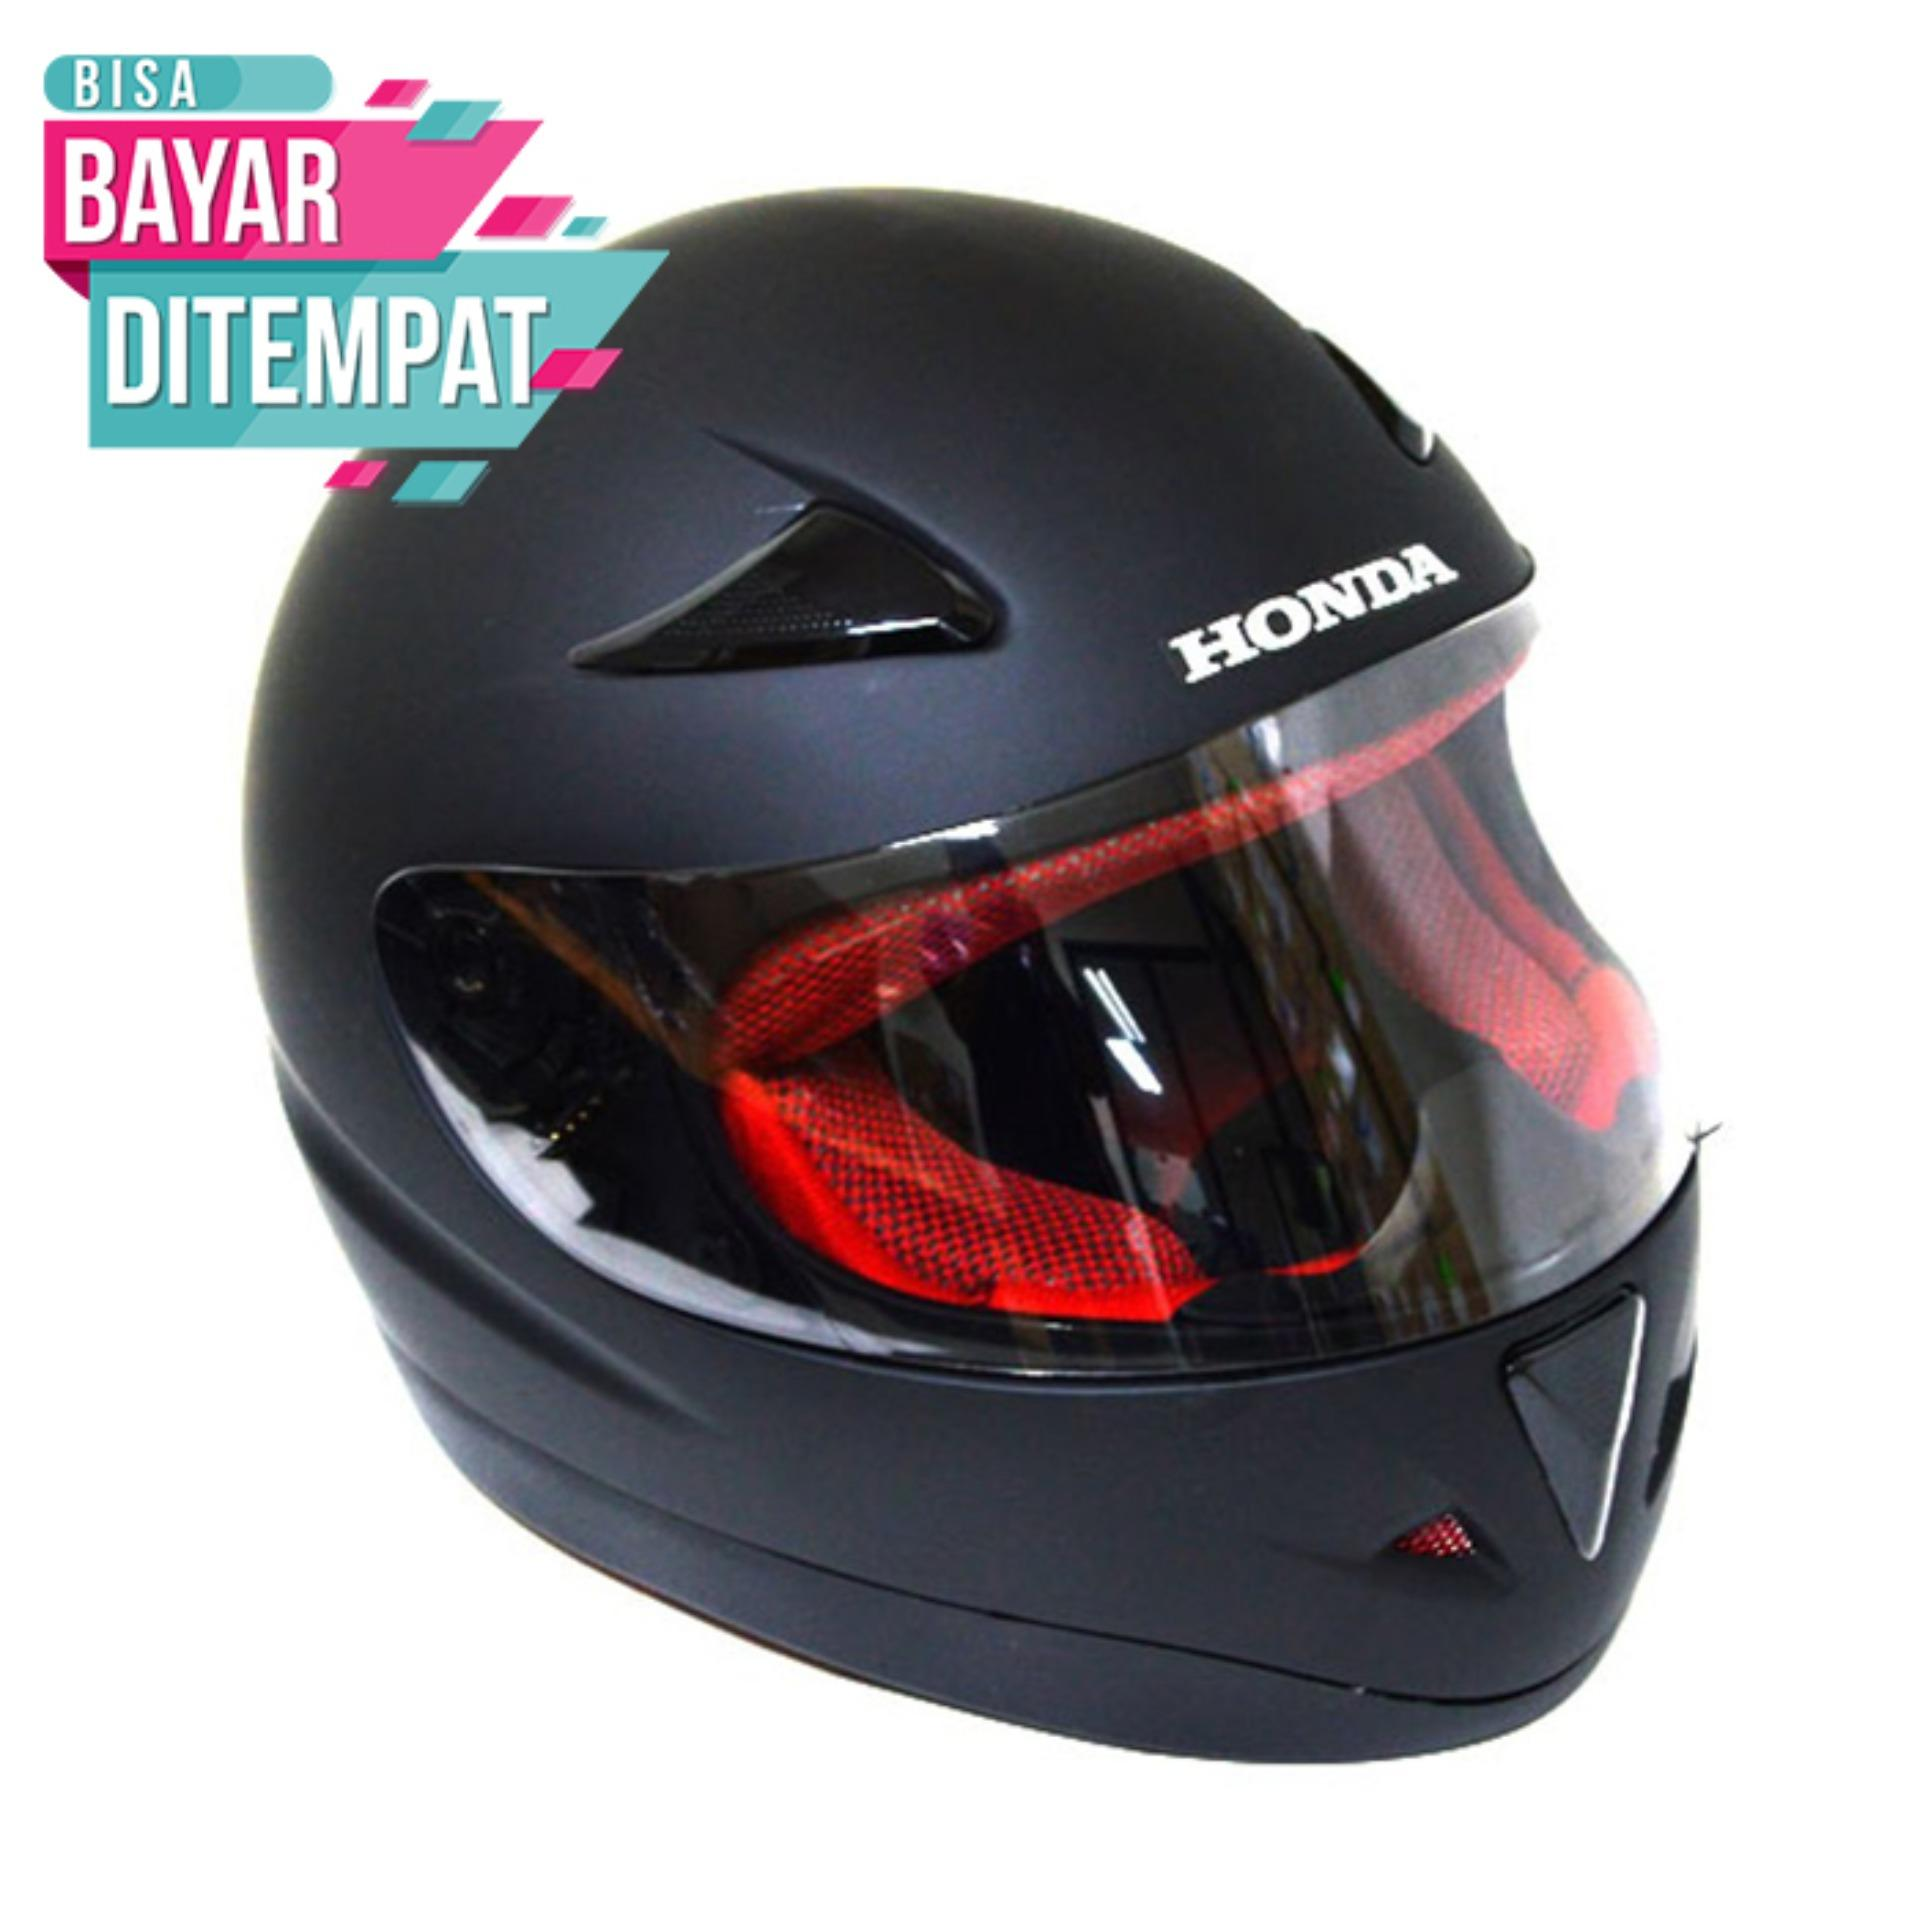 [Promo Best Seller] Helmet Full Face Honda CBR Hitam Kualitas Setara helm KYT INK GM WTO MSR BMC NHK